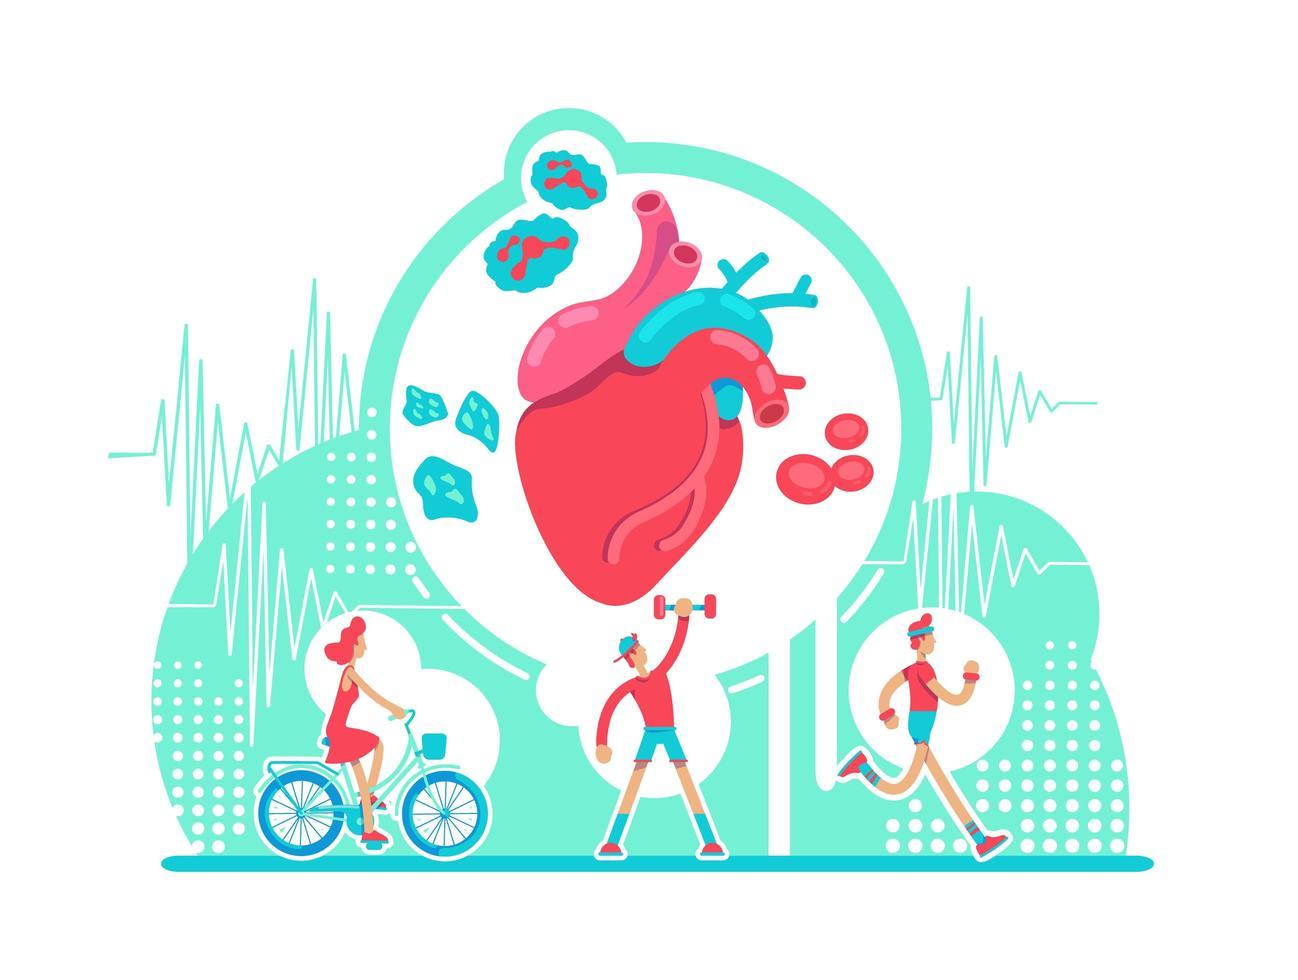 cardiovasculaire systeem gezondheidszorg vector